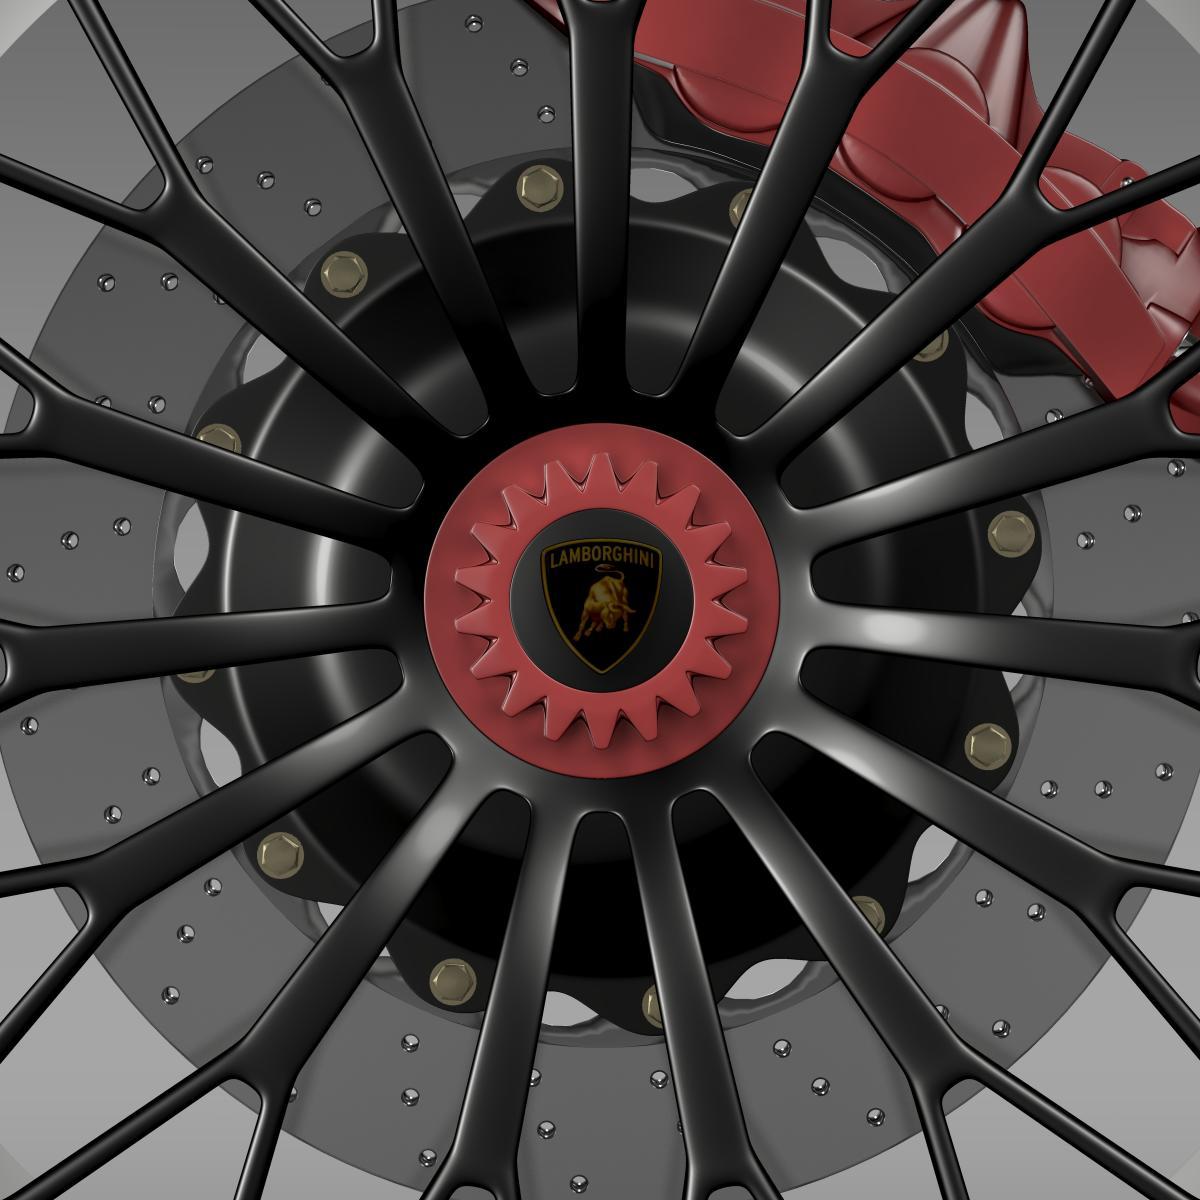 lamborghini aventador lp 750 4 sv wheel 3d model 3ds max fbx c4d lwo ma mb hrc xsi obj 210716